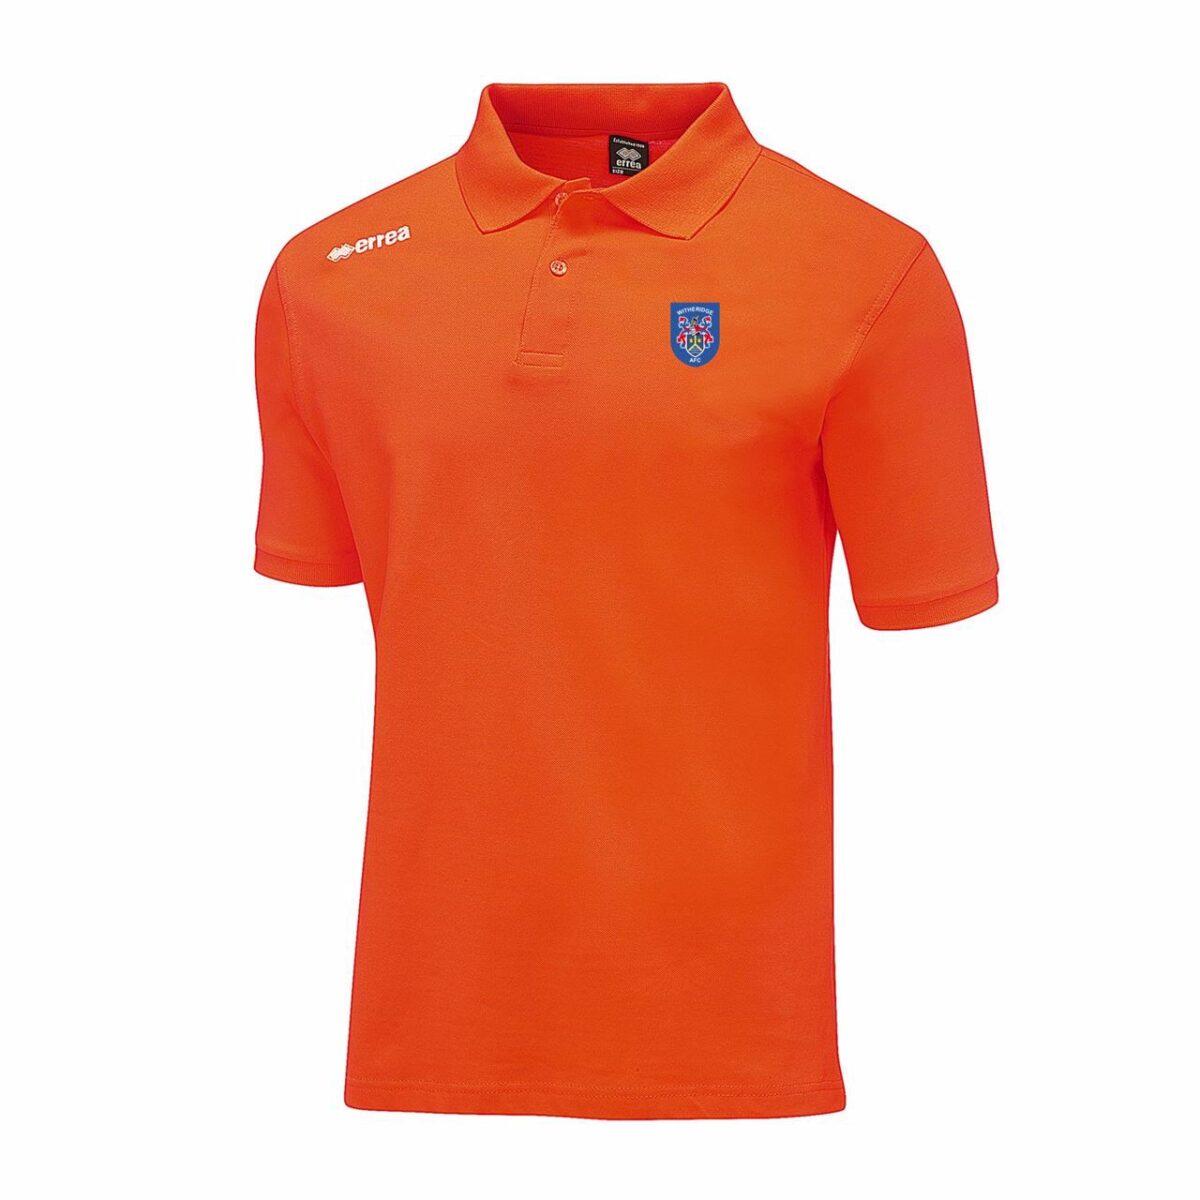 Witheridge Football Club Polo Shirt - Orange - Junior